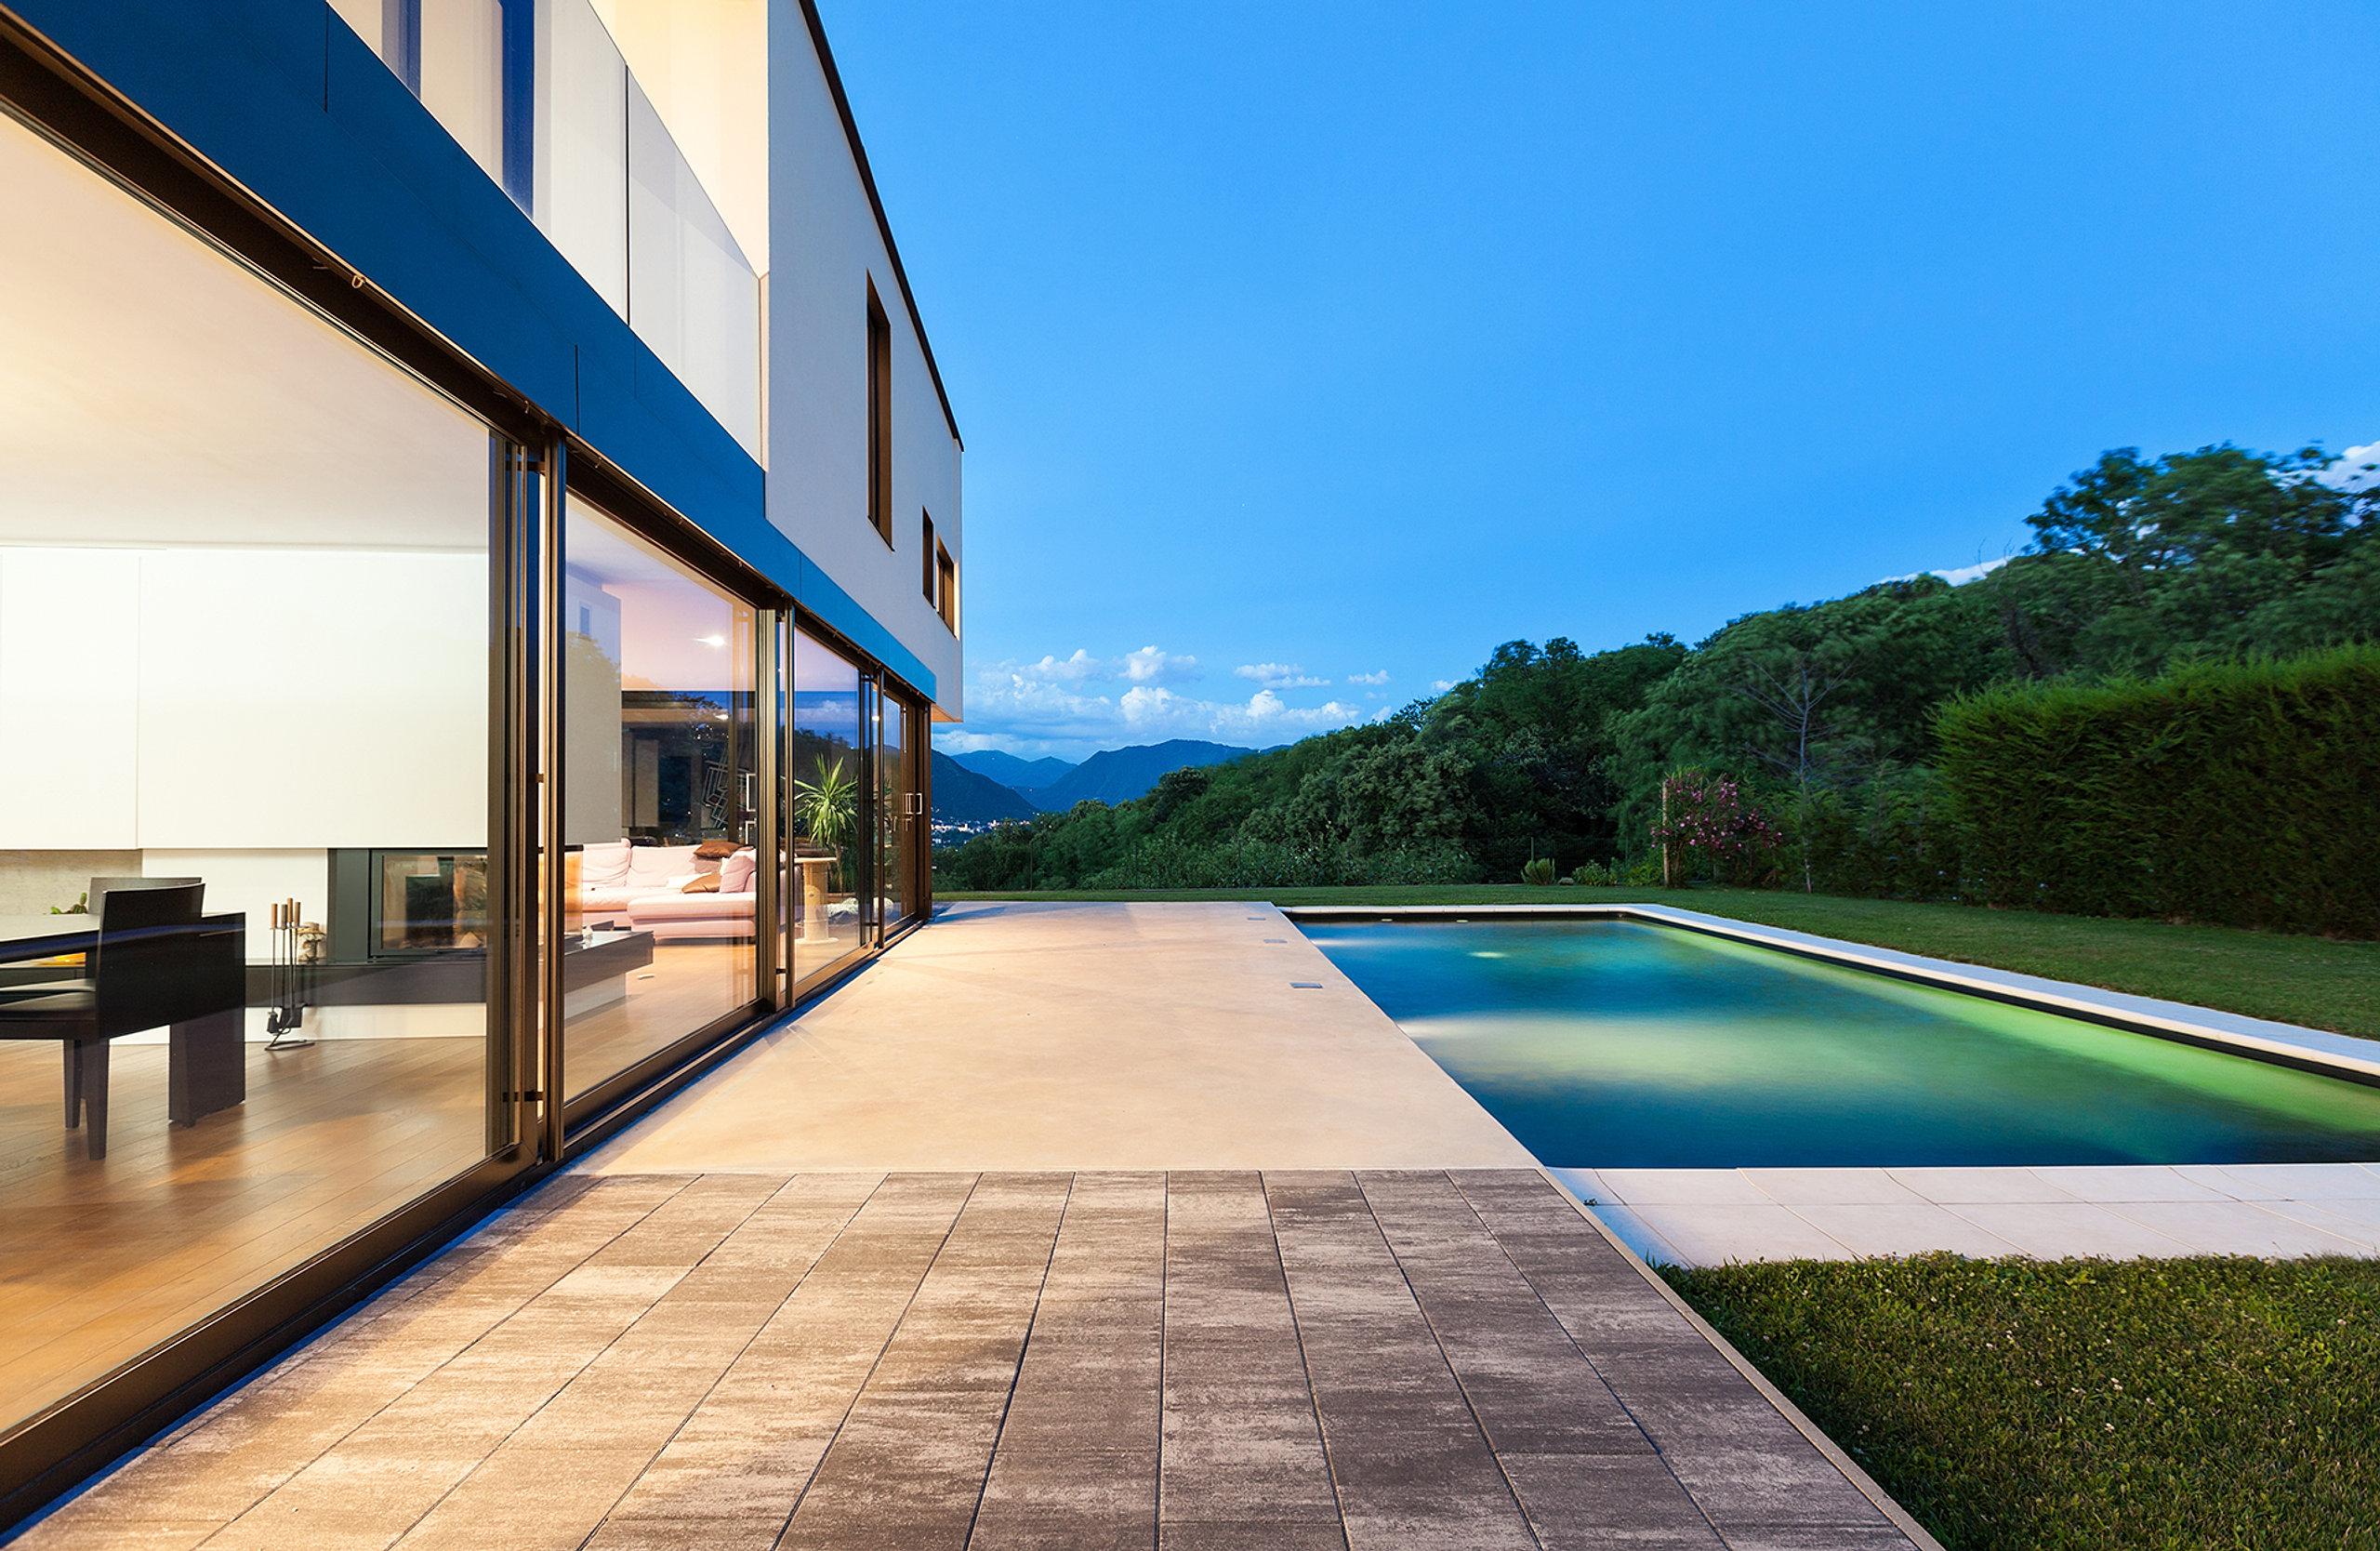 wetterhaus massivholzhaus bauen. Black Bedroom Furniture Sets. Home Design Ideas